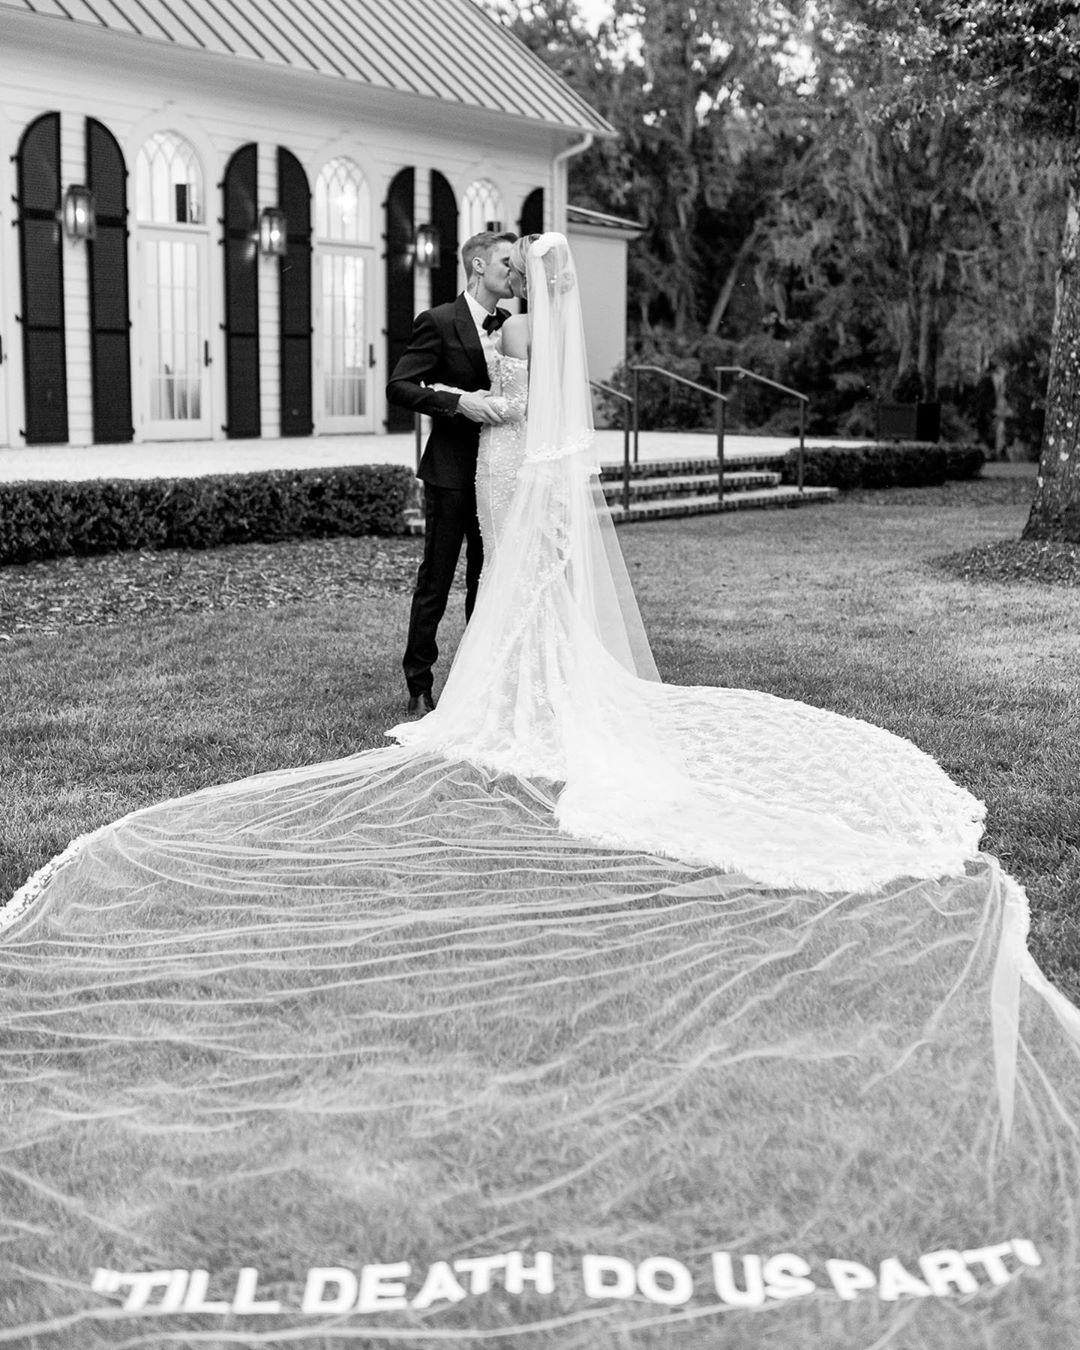 Hailey Bieber Just Debuted Her Stunning Off-White Wedding Dress